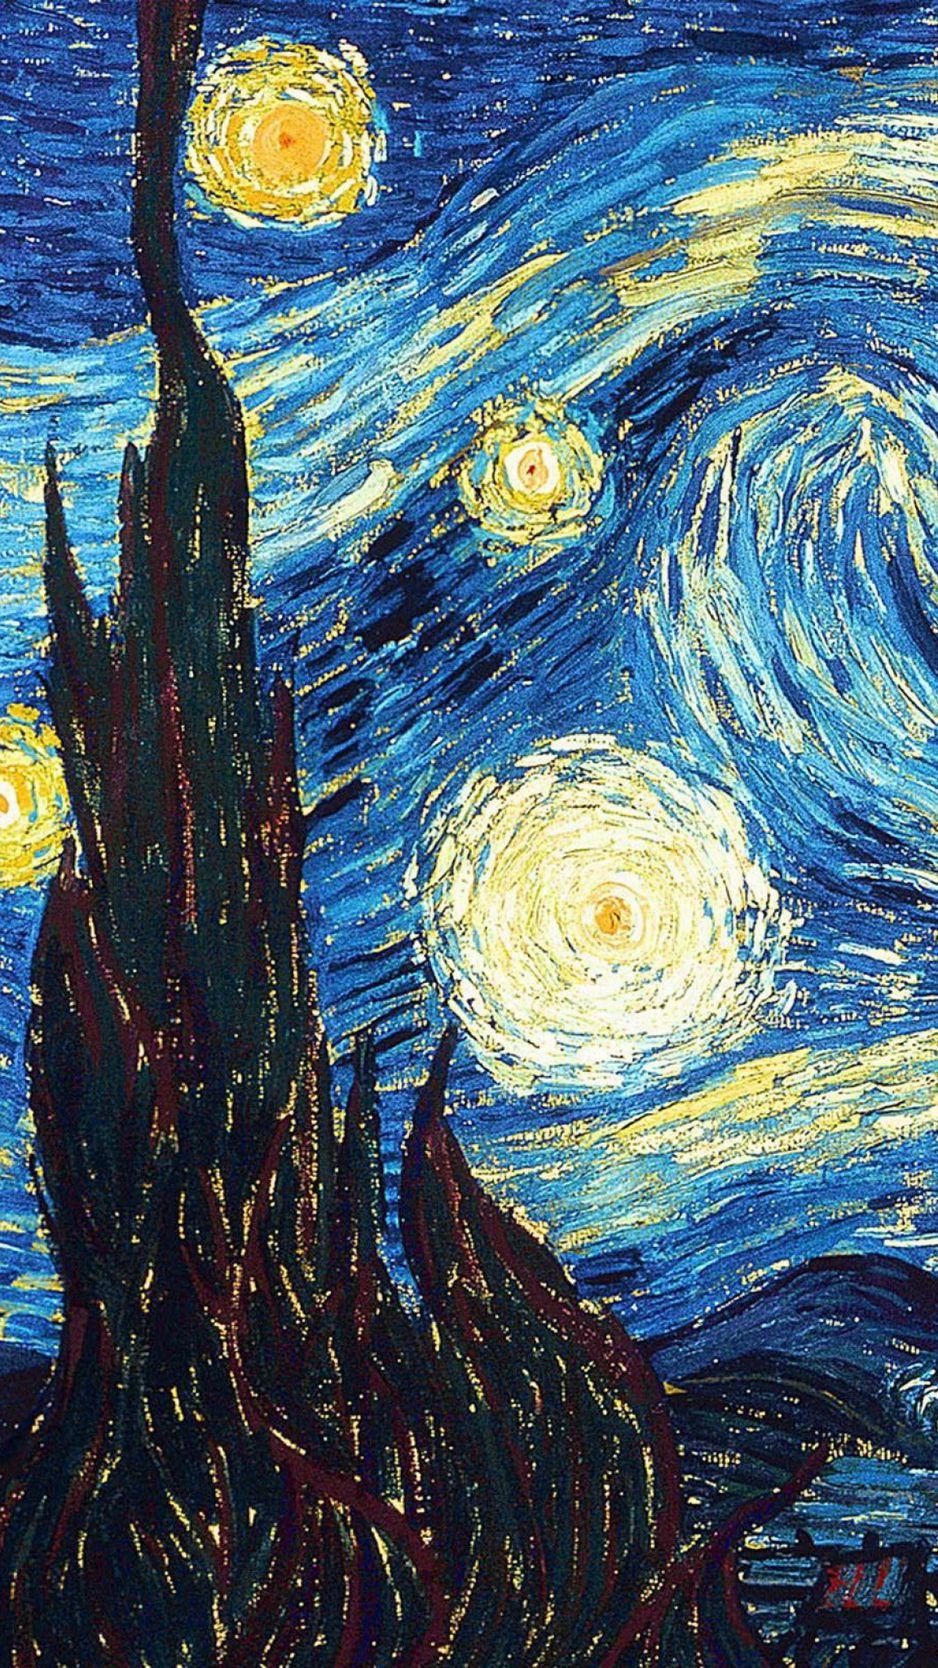 938x1668 Wallpaper vincent van gogh, the starry night, oil, canvas